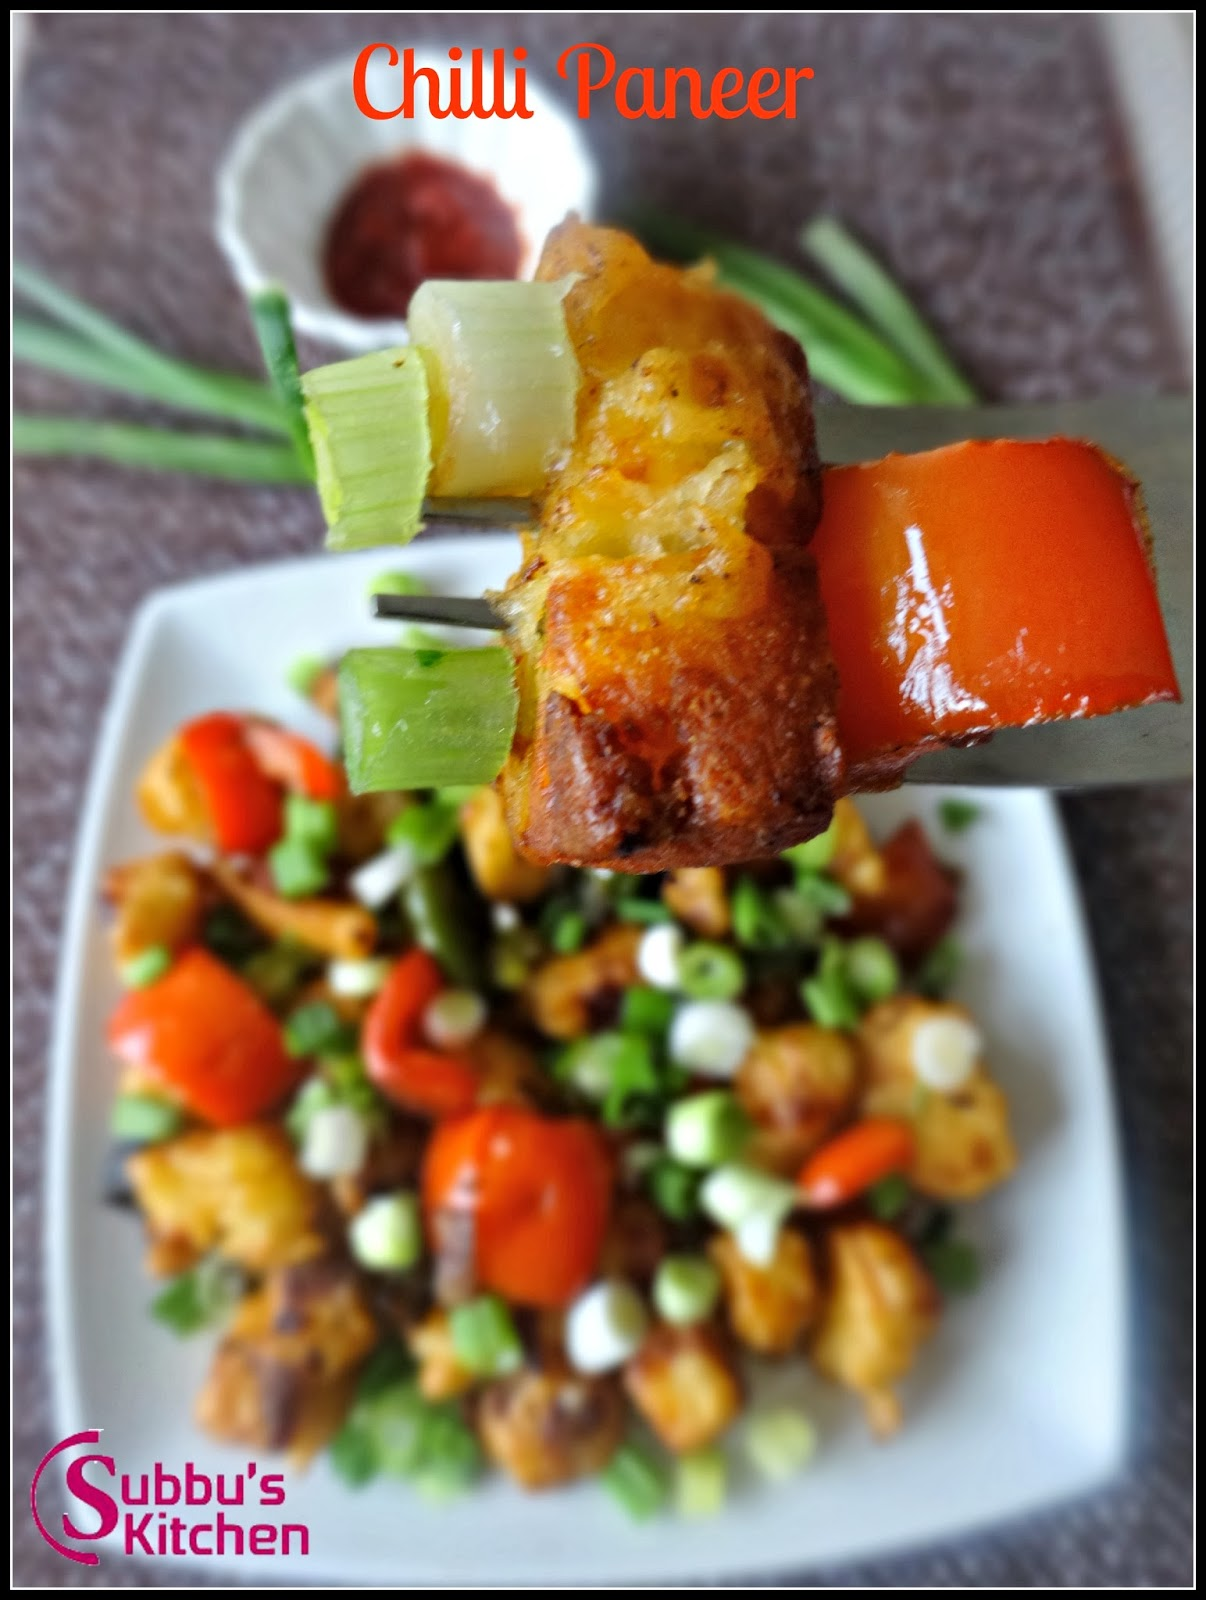 Chilli paneer subbus kitchen forumfinder Images